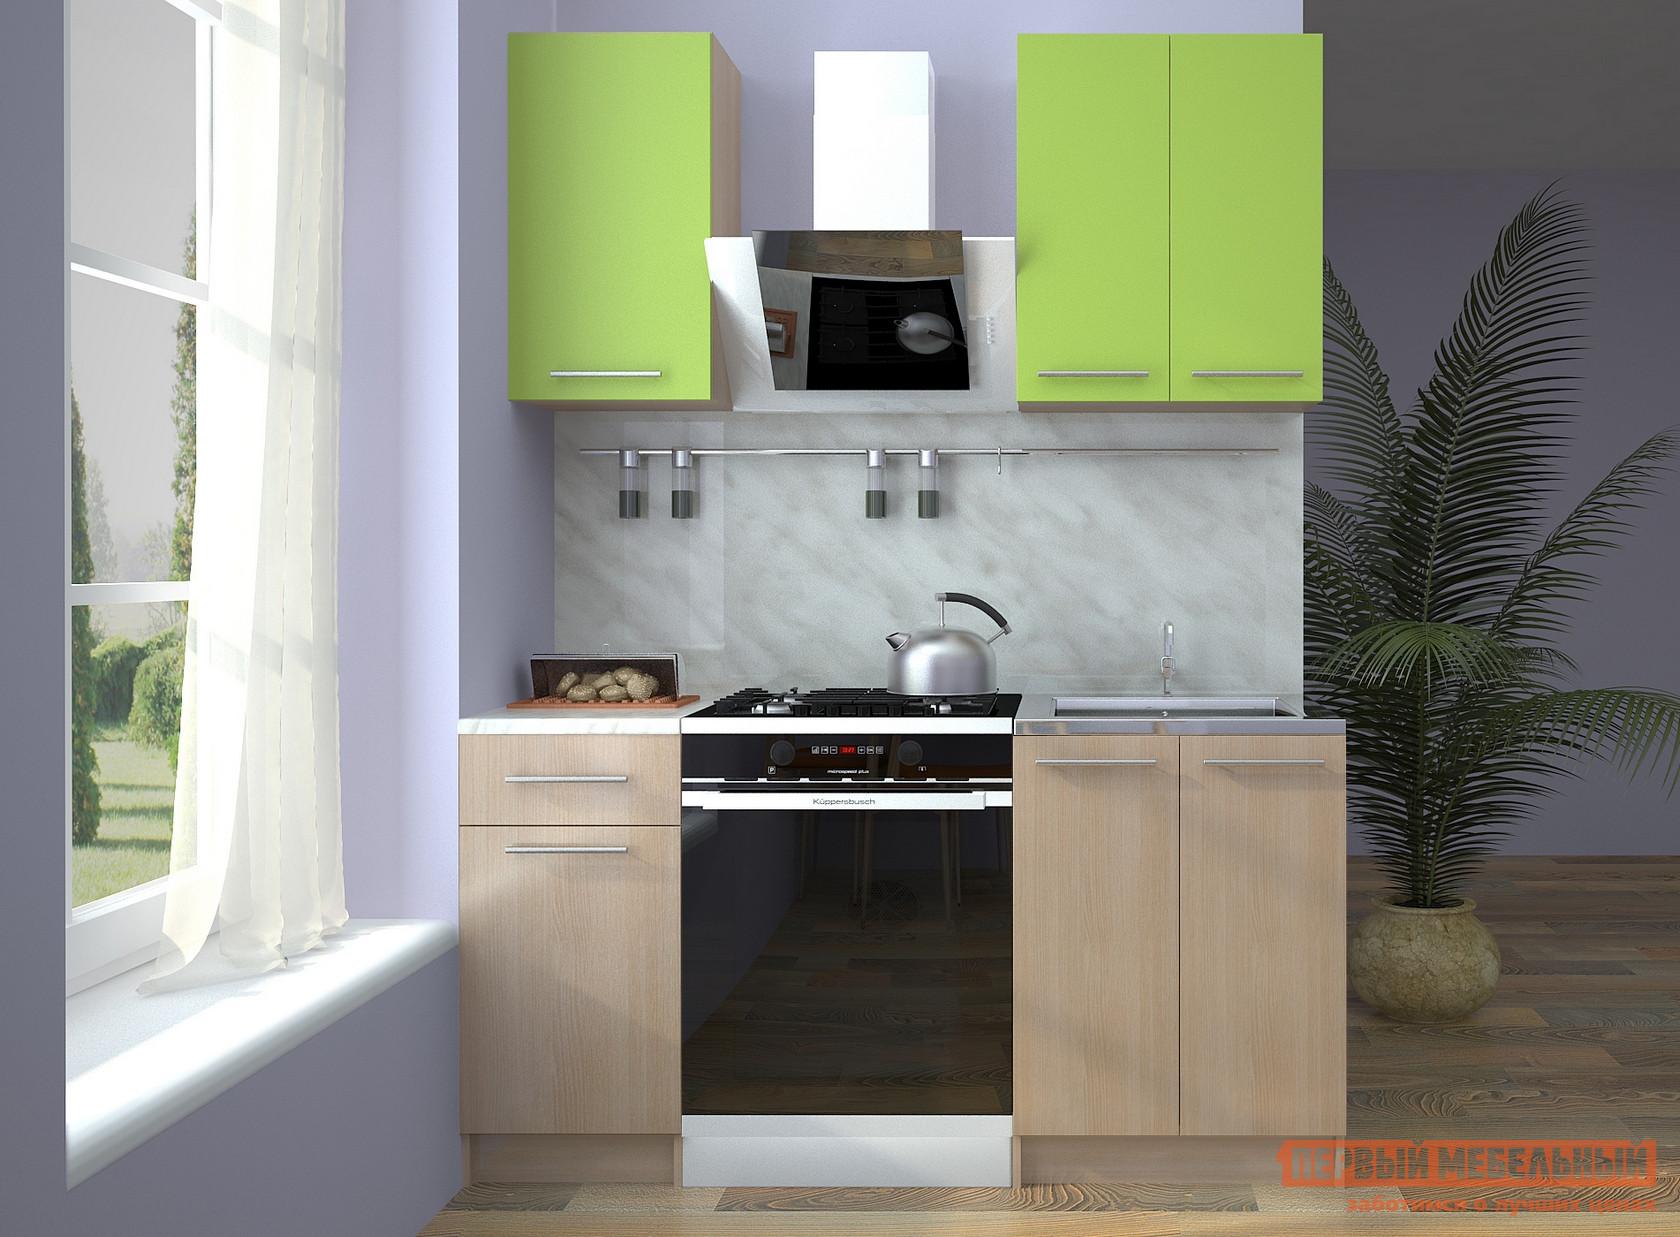 Кухонный гарнитур НК-Мебель Далари 160 см спальный гарнитур нк мебель паулина к1